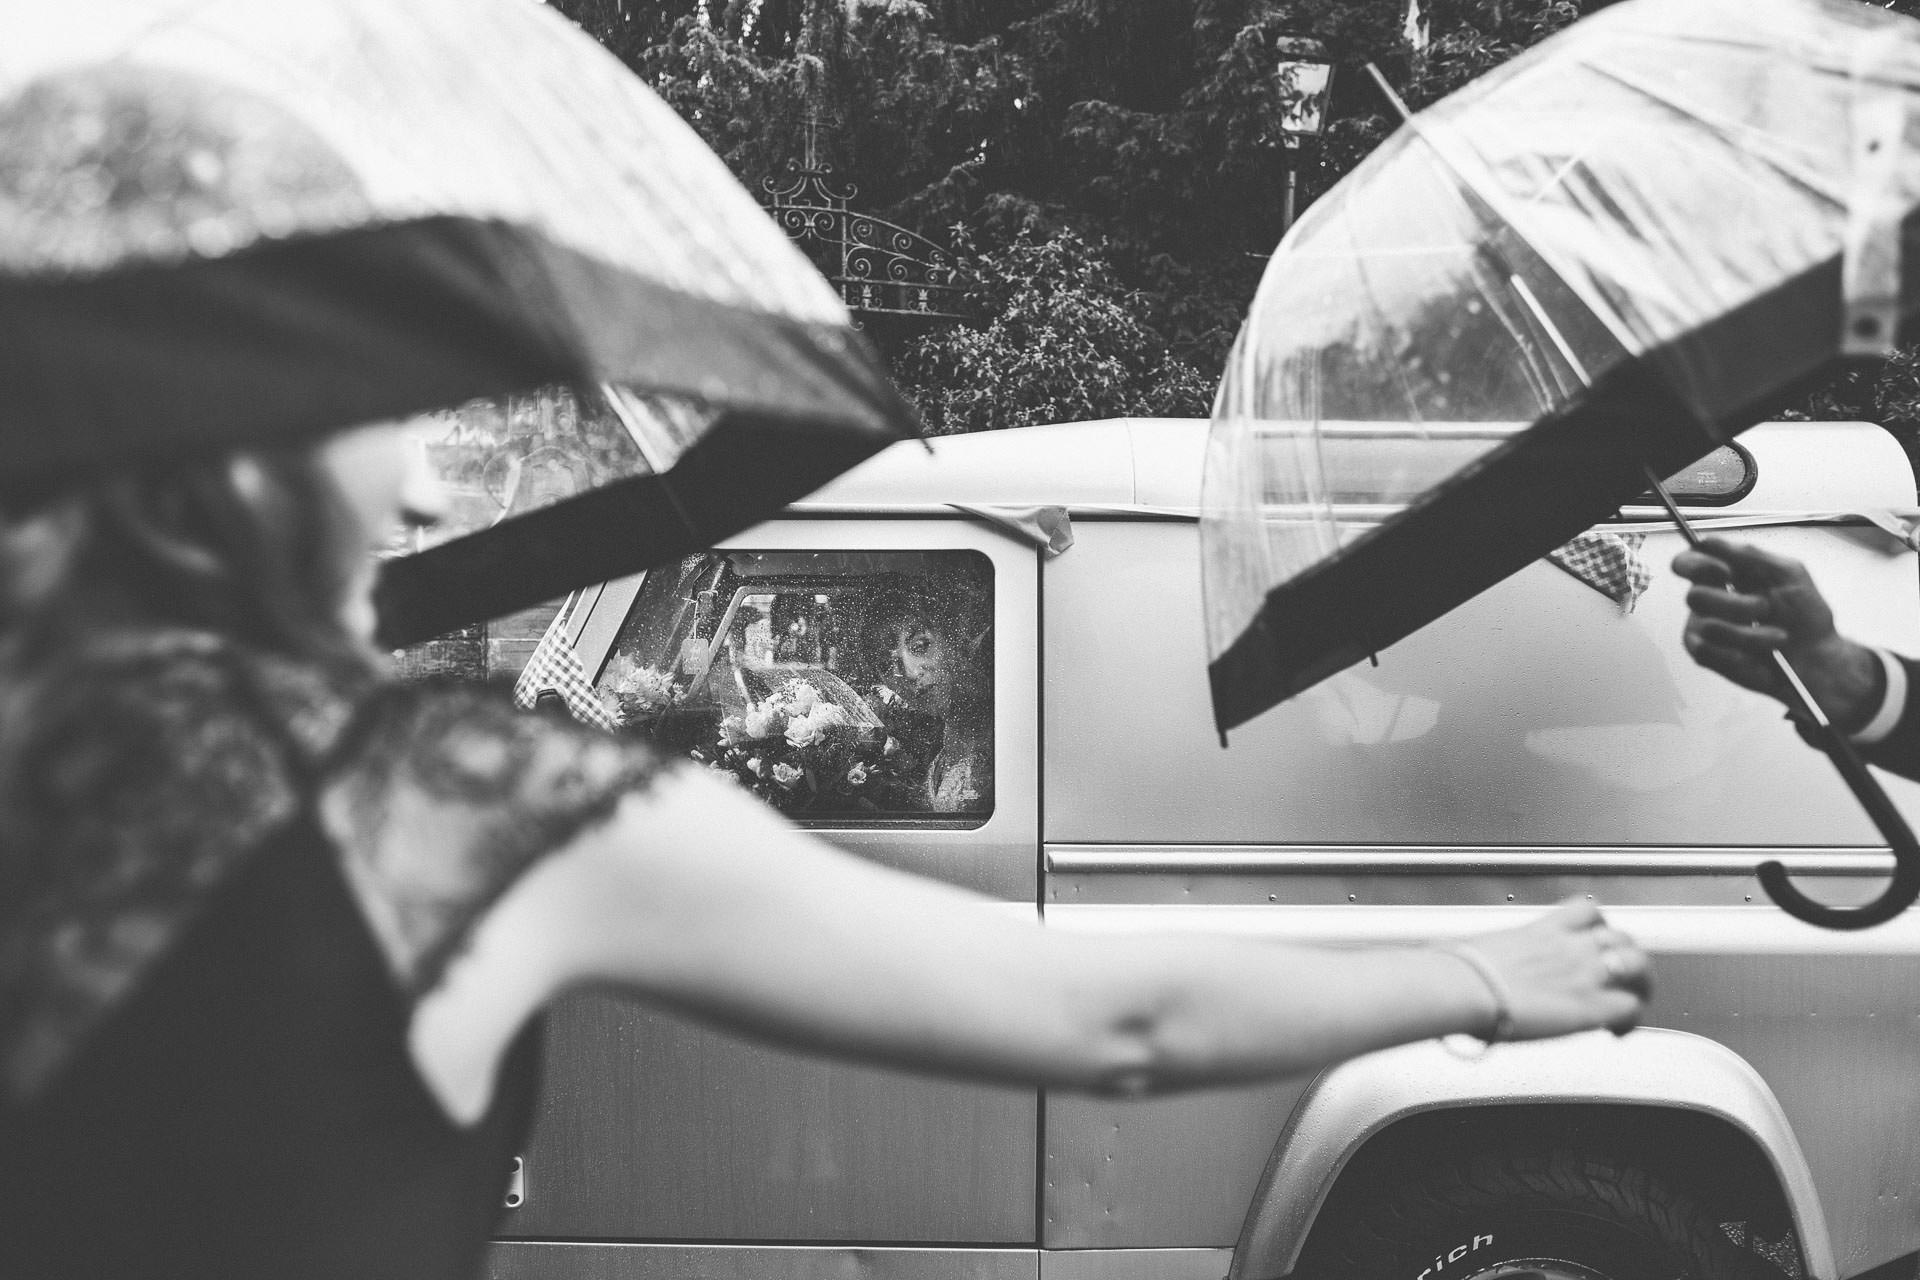 cheshire-rustic-farm-wedding-photography-helen-simon-37